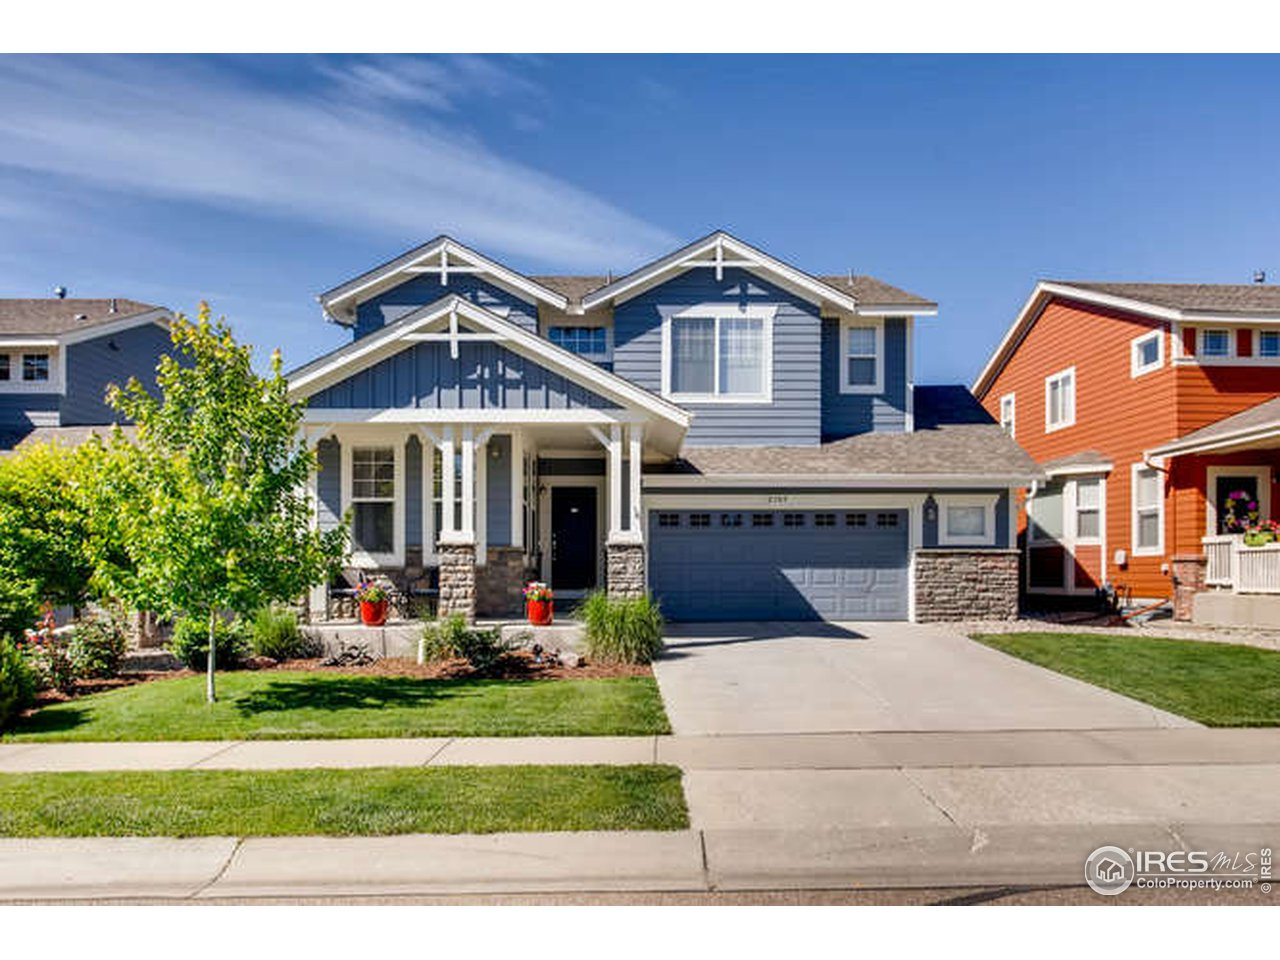 2309 Dolan St, Fort Collins CO 80528